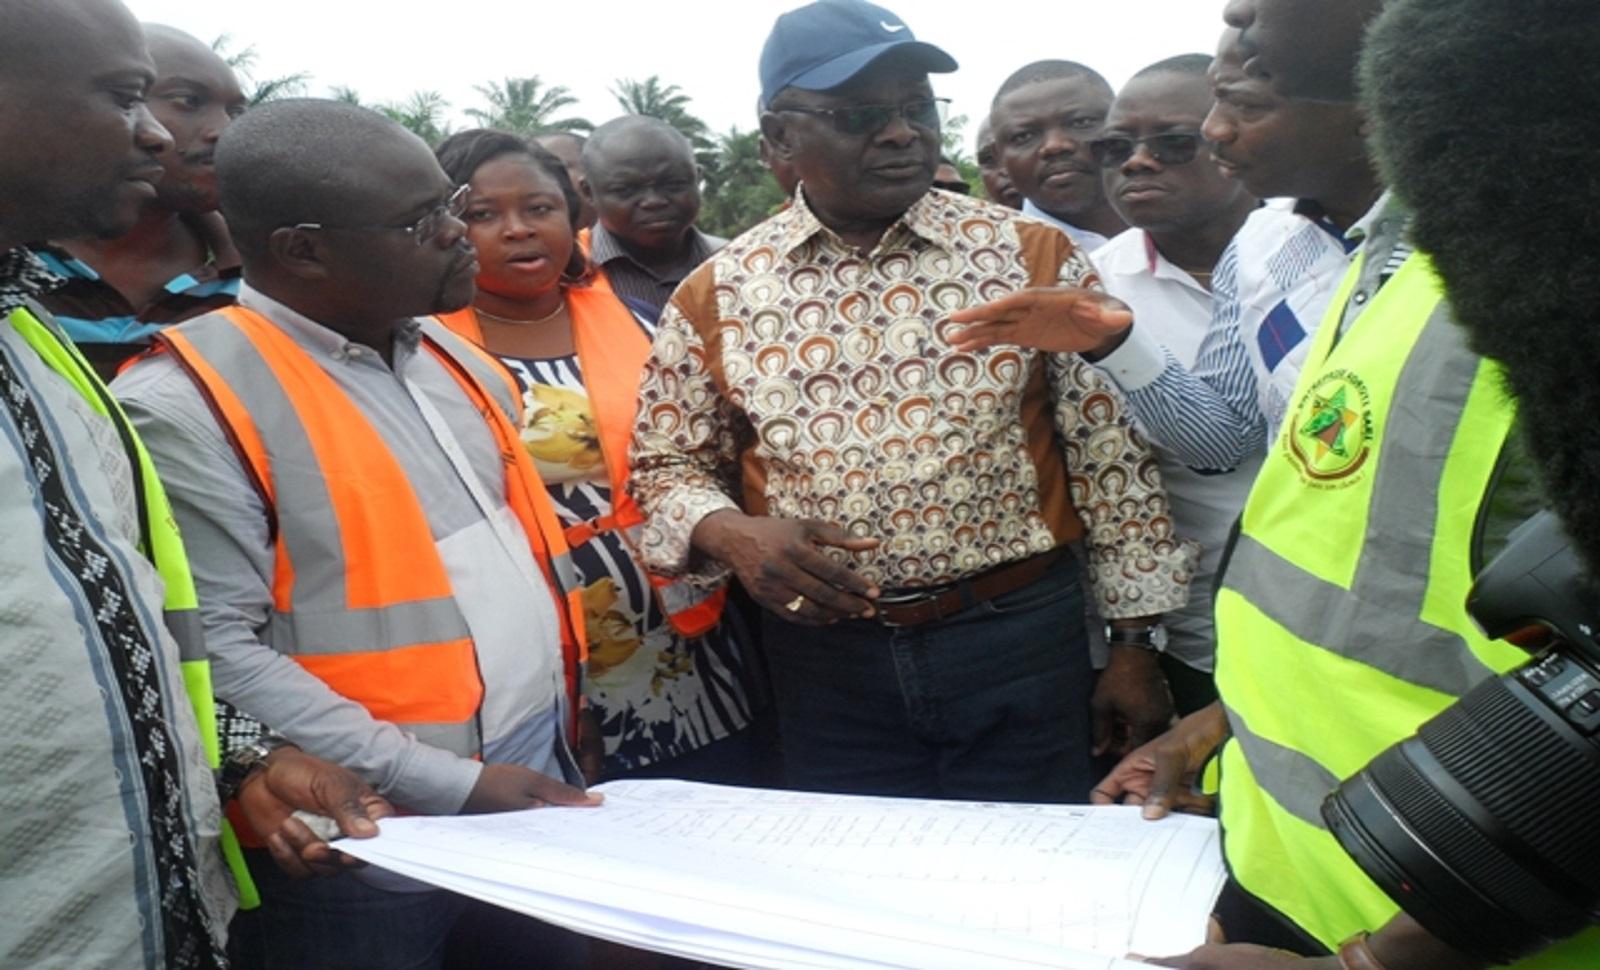 Cyr Koty satisfait de l'évolution des travaux de la route Zagnanado-Banamè-Paouignan. / Photo : agencebeninpresse.info